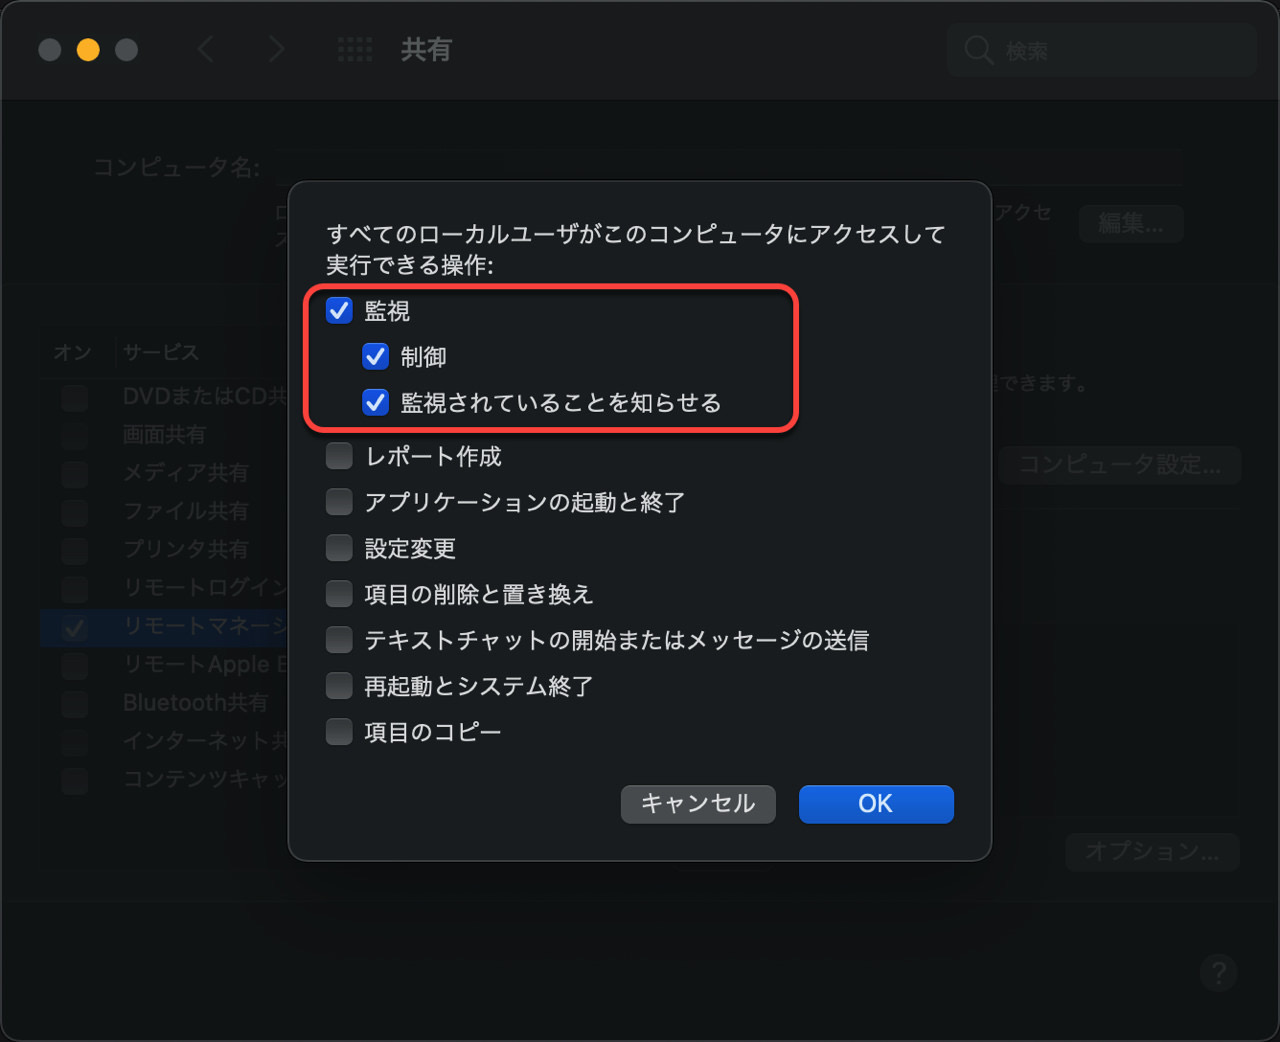 Screen monitored9